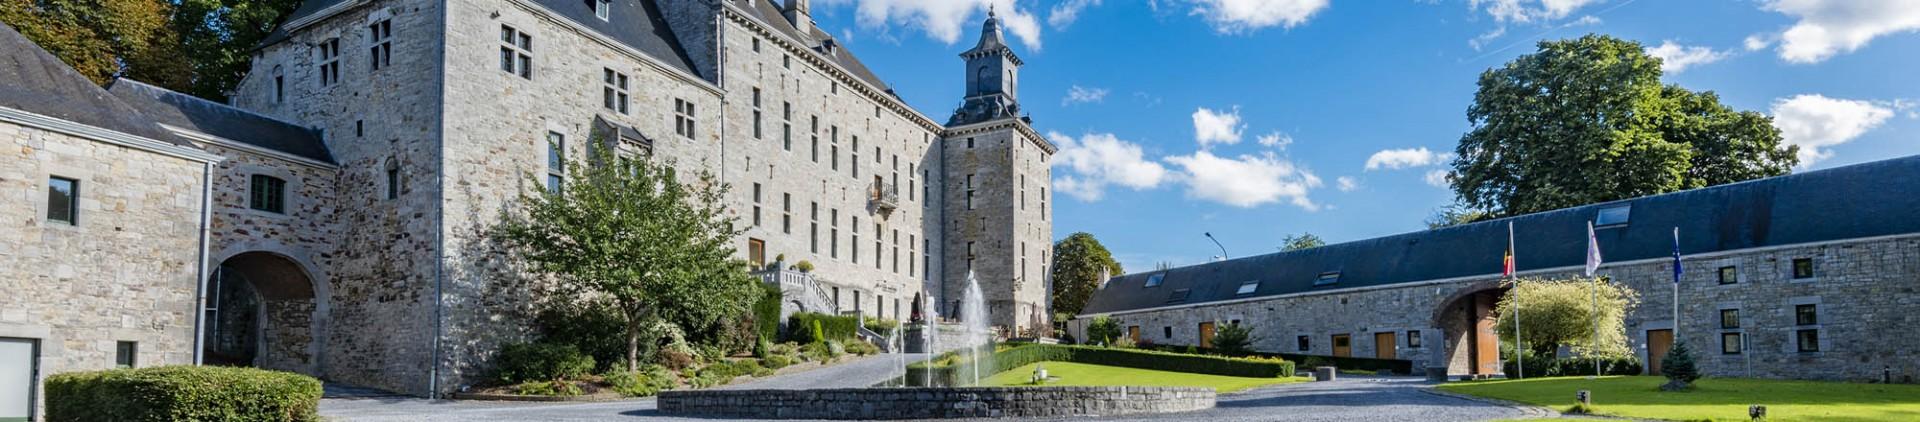 Château de Harzé - Offre privilège Vacancesweb